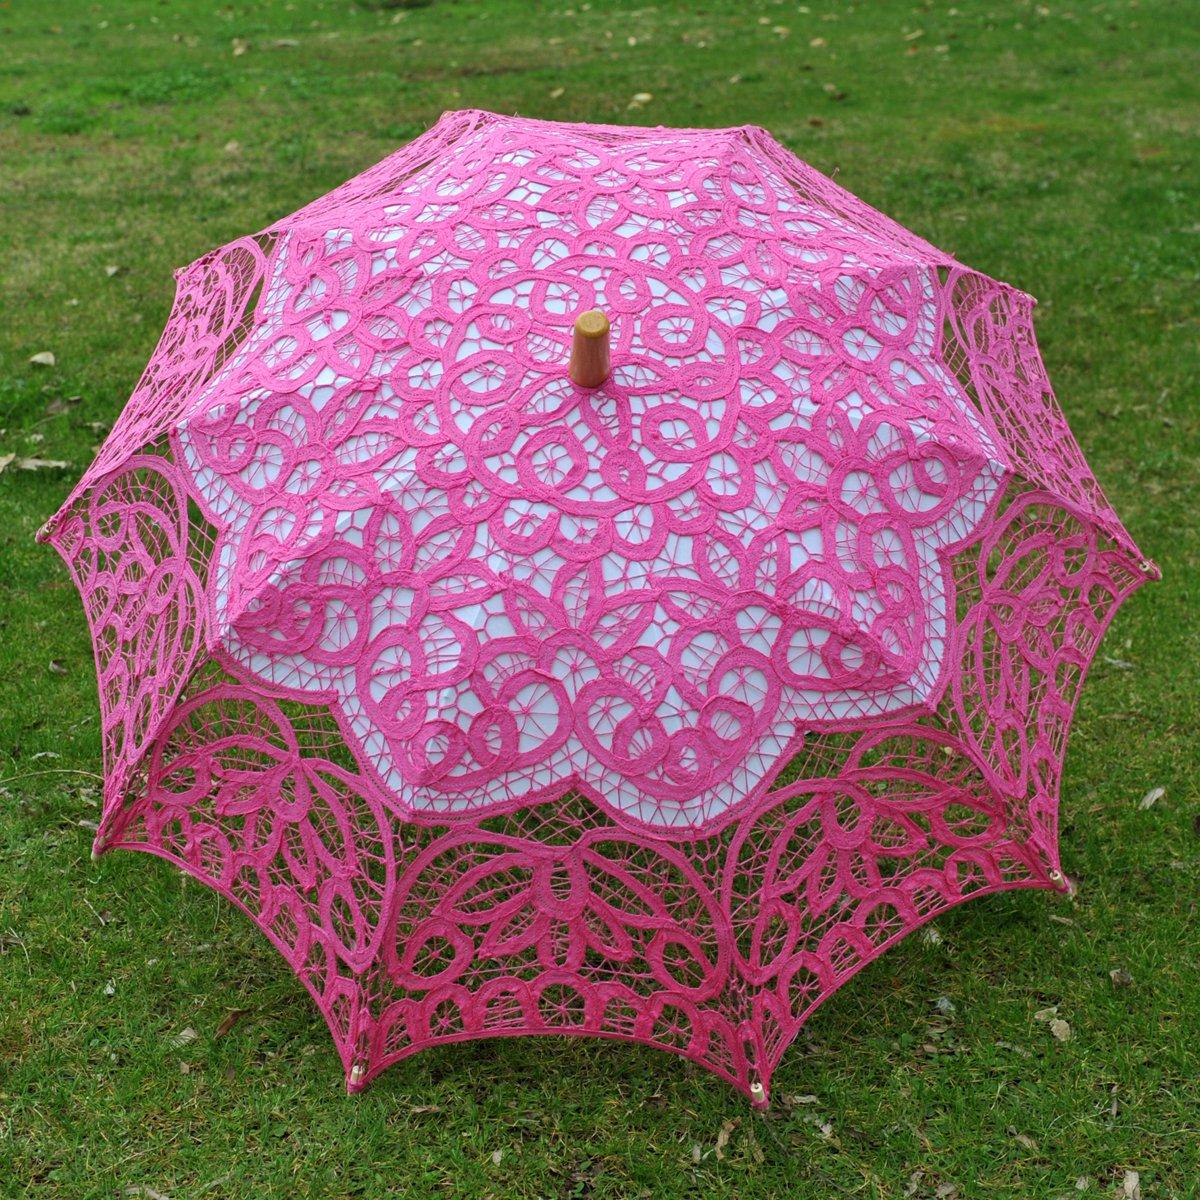 Topwedding Classic Cotton Lace Parasol Umbrella Bridal Shower Decoration, Fuschia by Topwedding (Image #8)